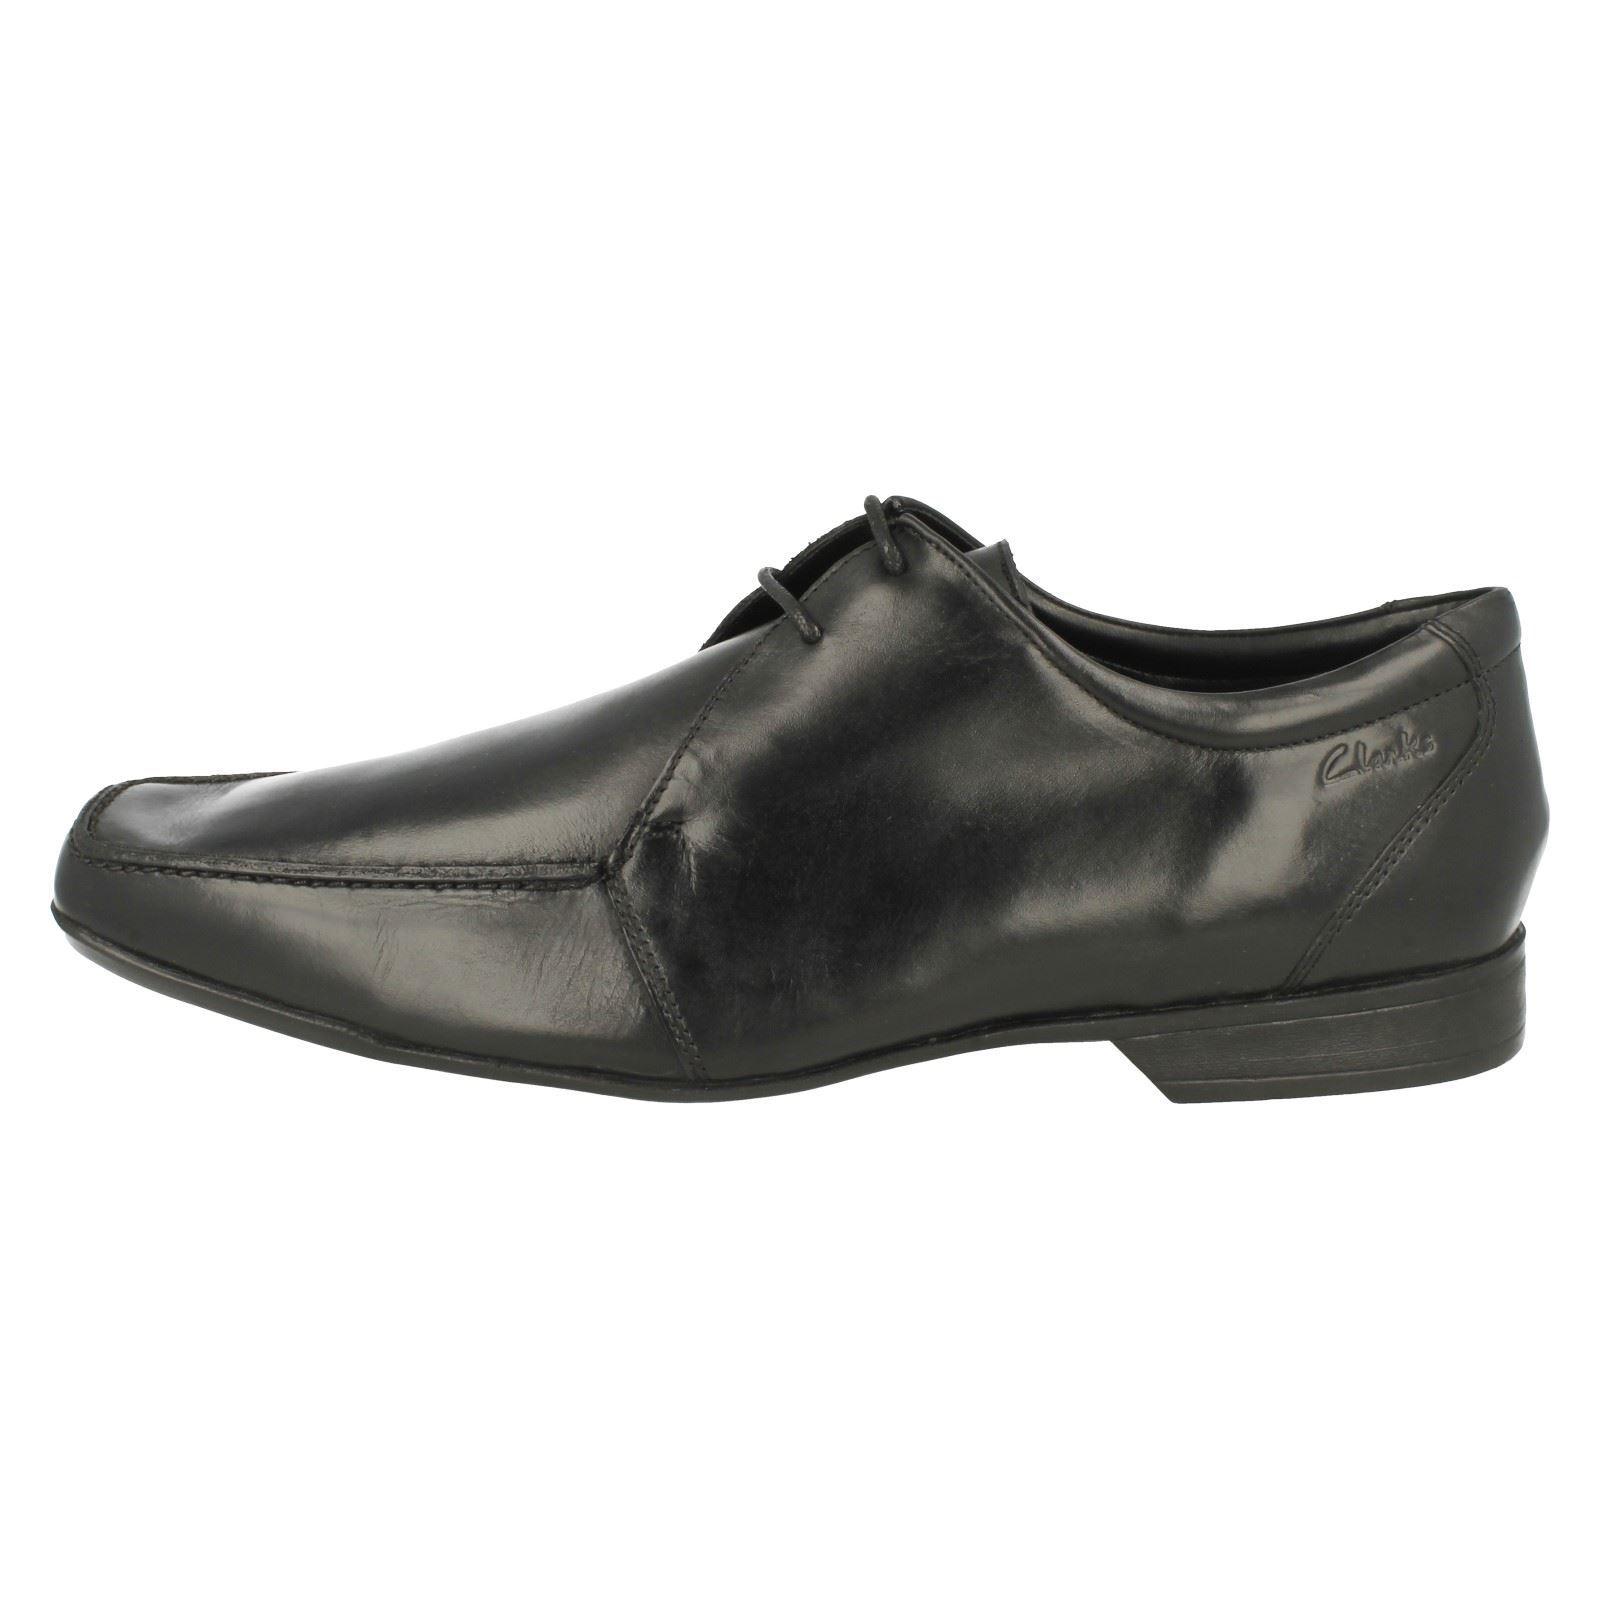 Uomo Clarks Schuhes 'Agility Mode' Smart Leder Schuhes Clarks  K 2afcff